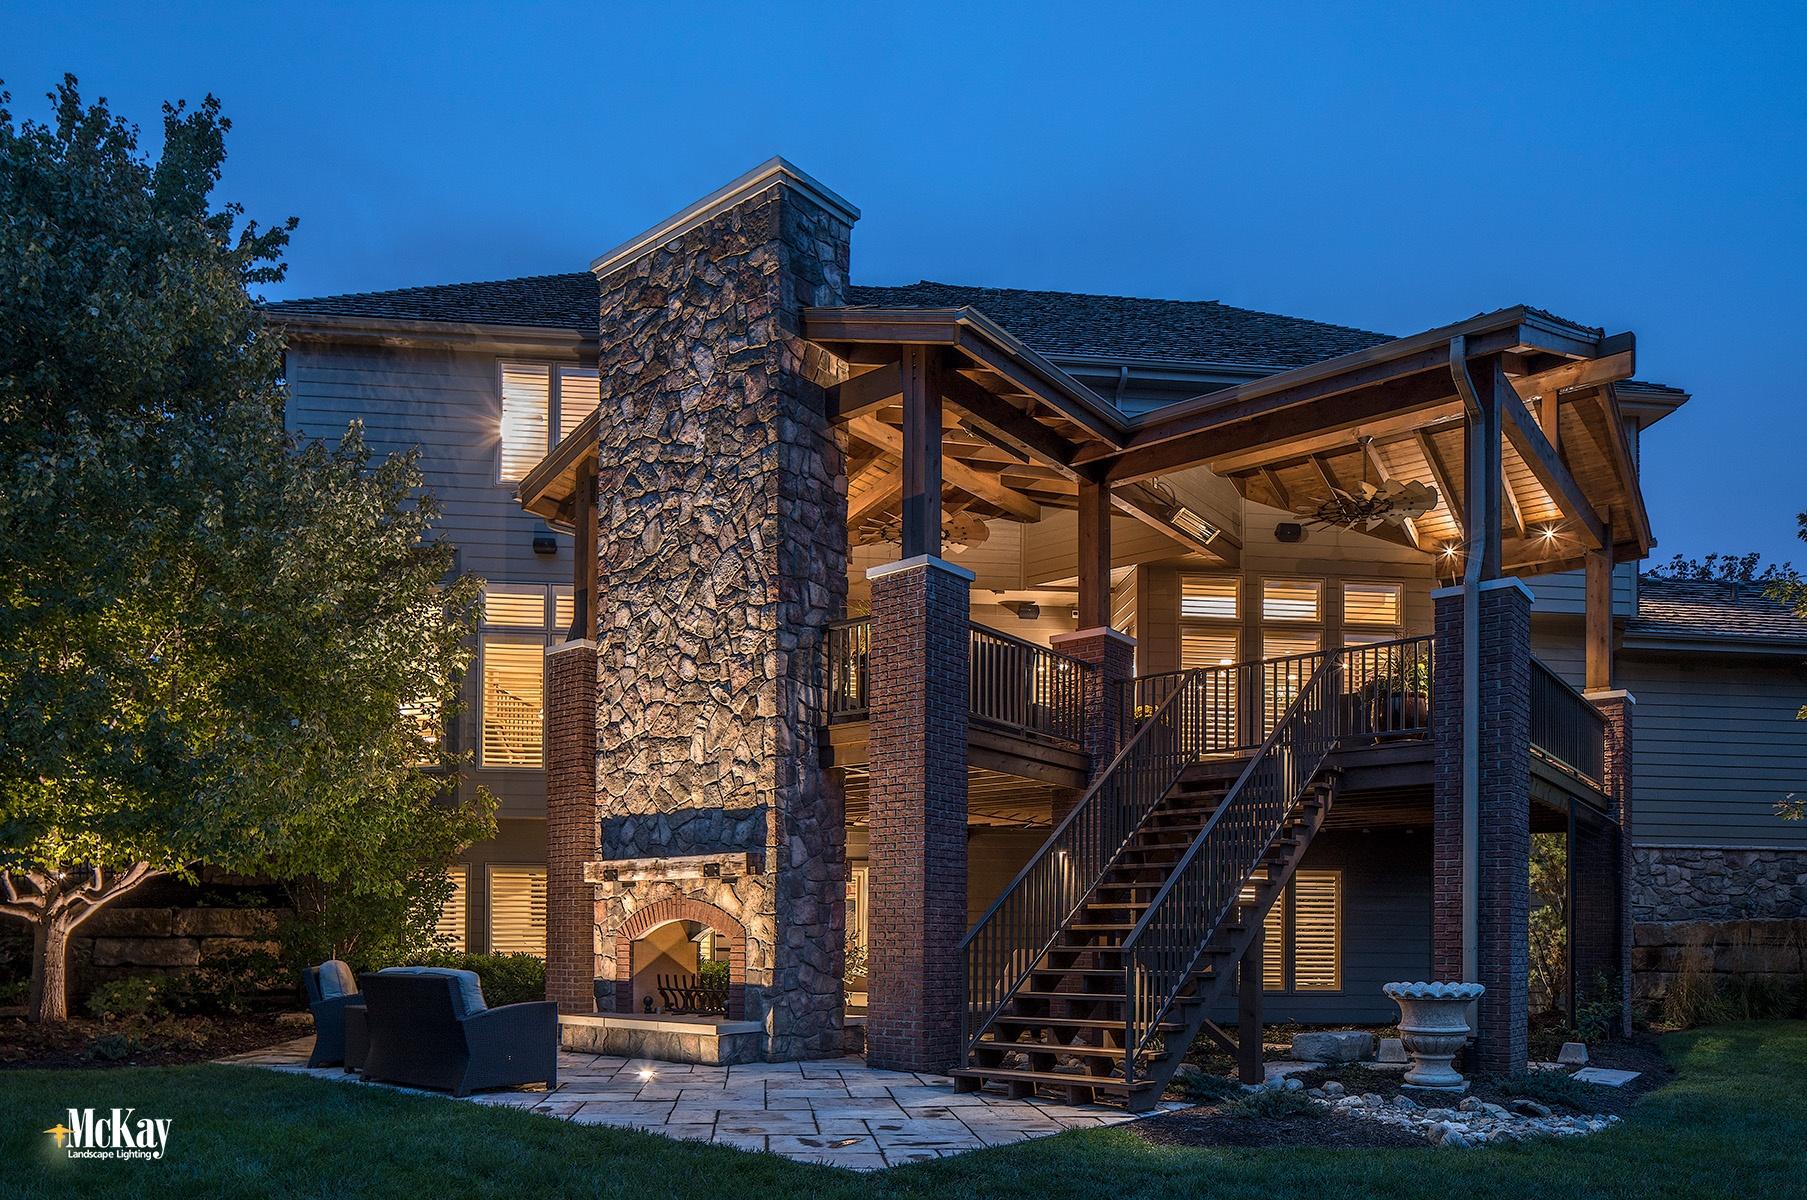 Installing Landscape Lighting to an Outdoor Fireplace Omaha Nebraska   McKay Landscape Lighting